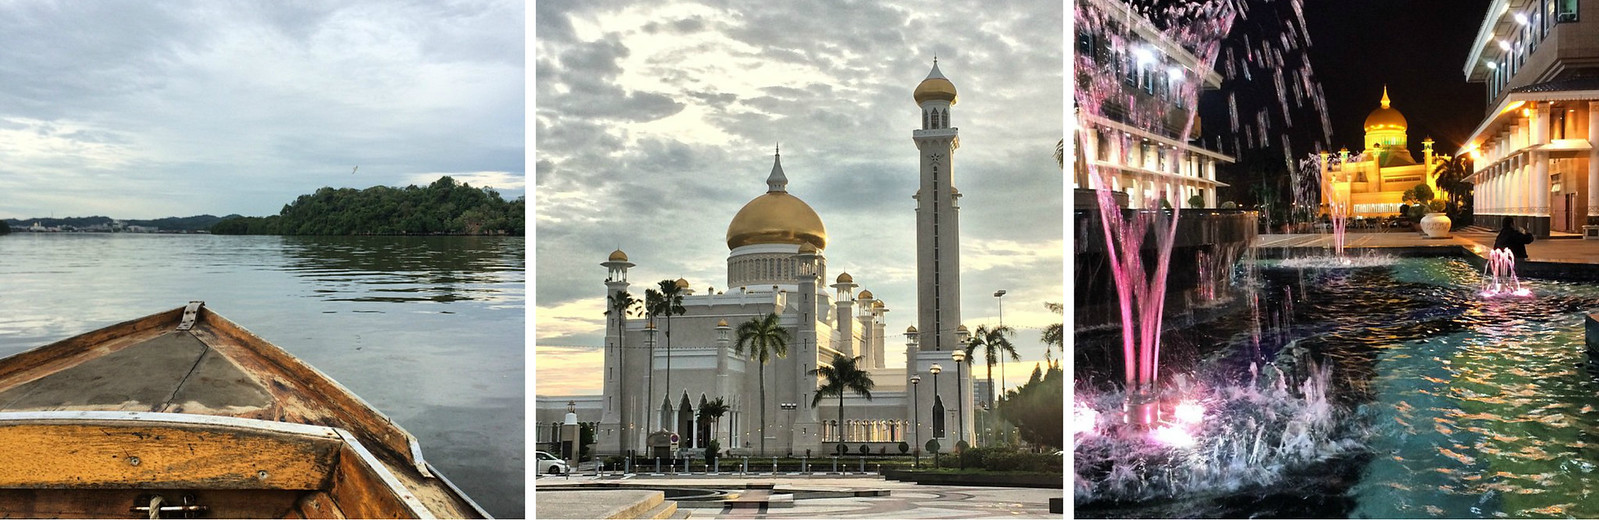 PicMonkey Collage Brunei